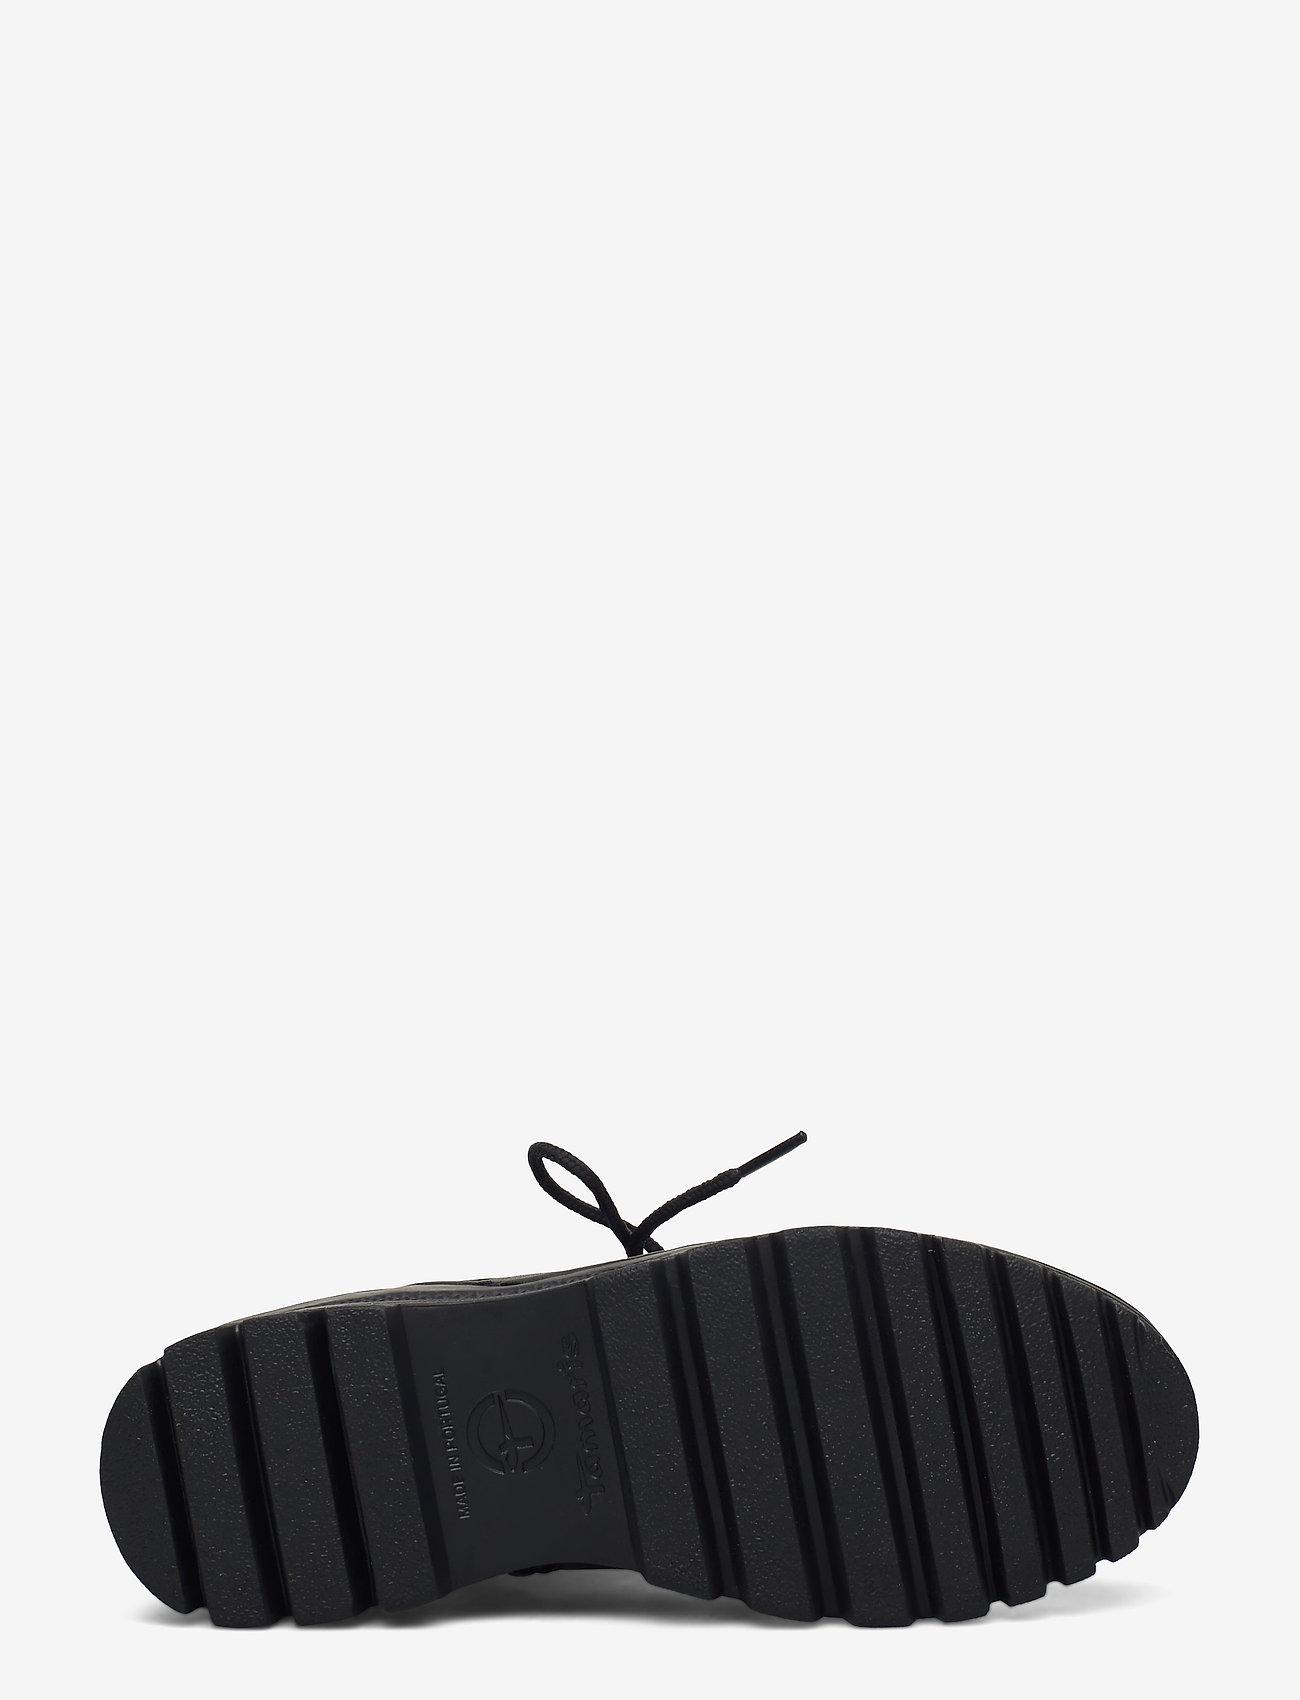 Woms Boots (Black) (99.95 €) - Tamaris fvvu9